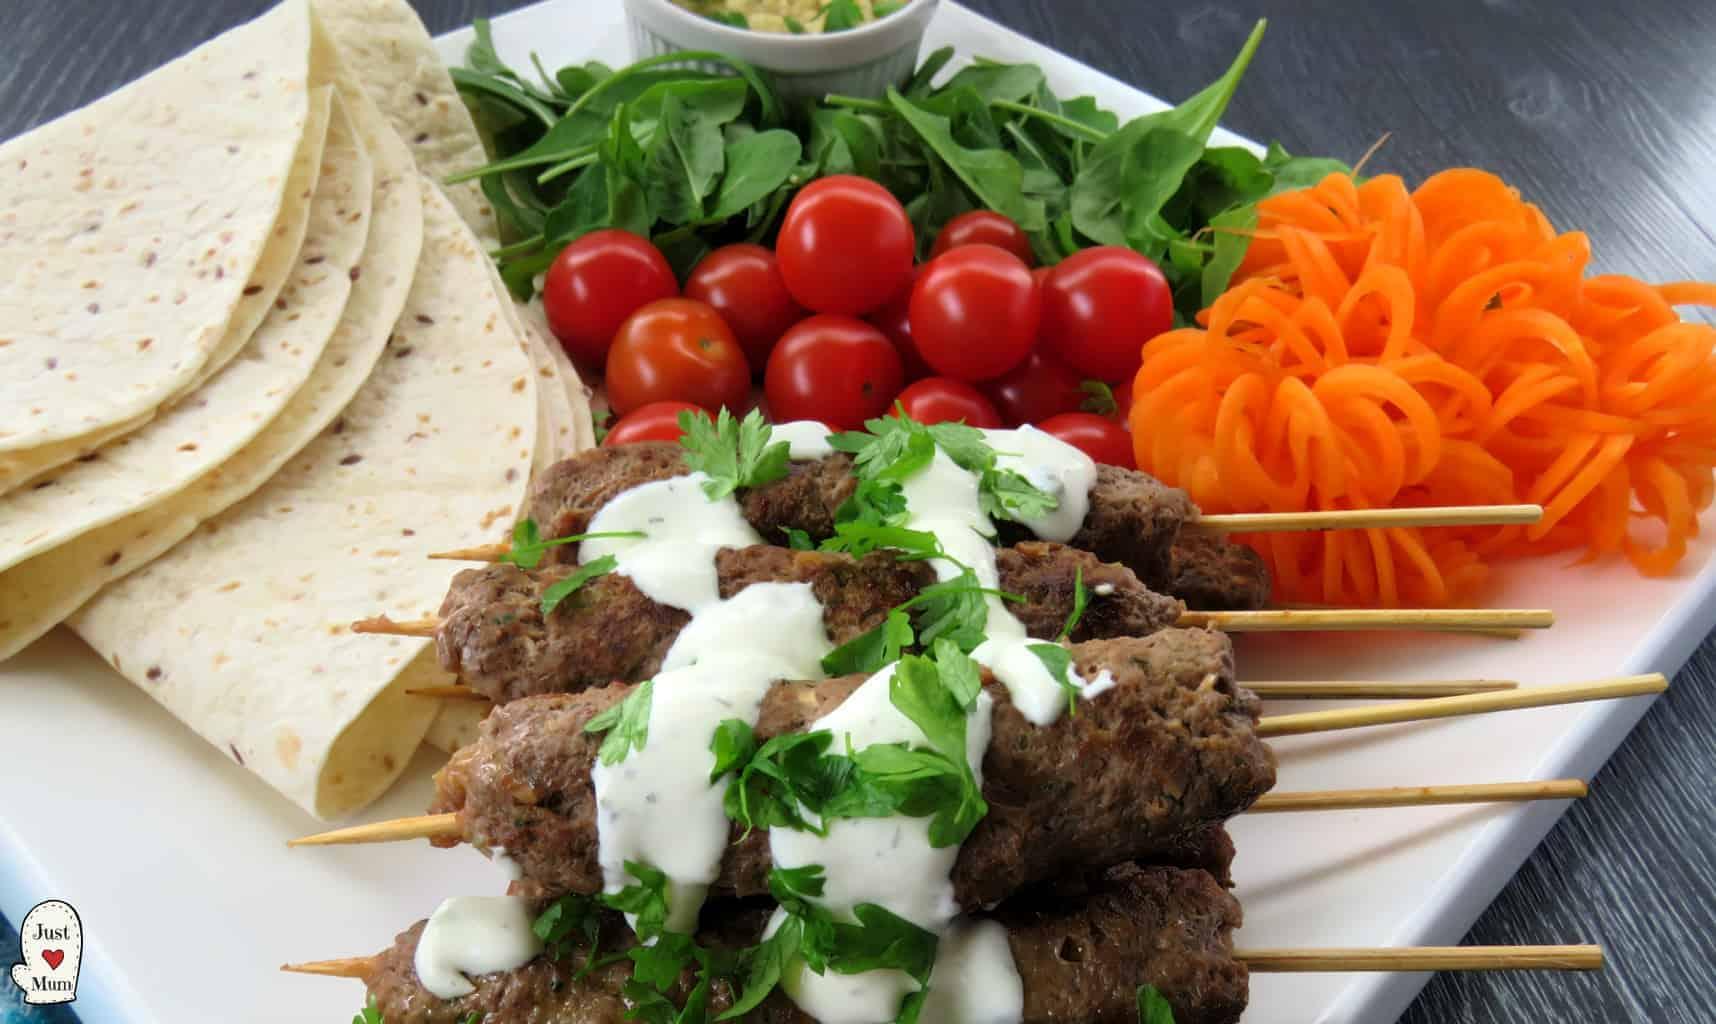 Just A Mum's Beef & Lamb Kofta